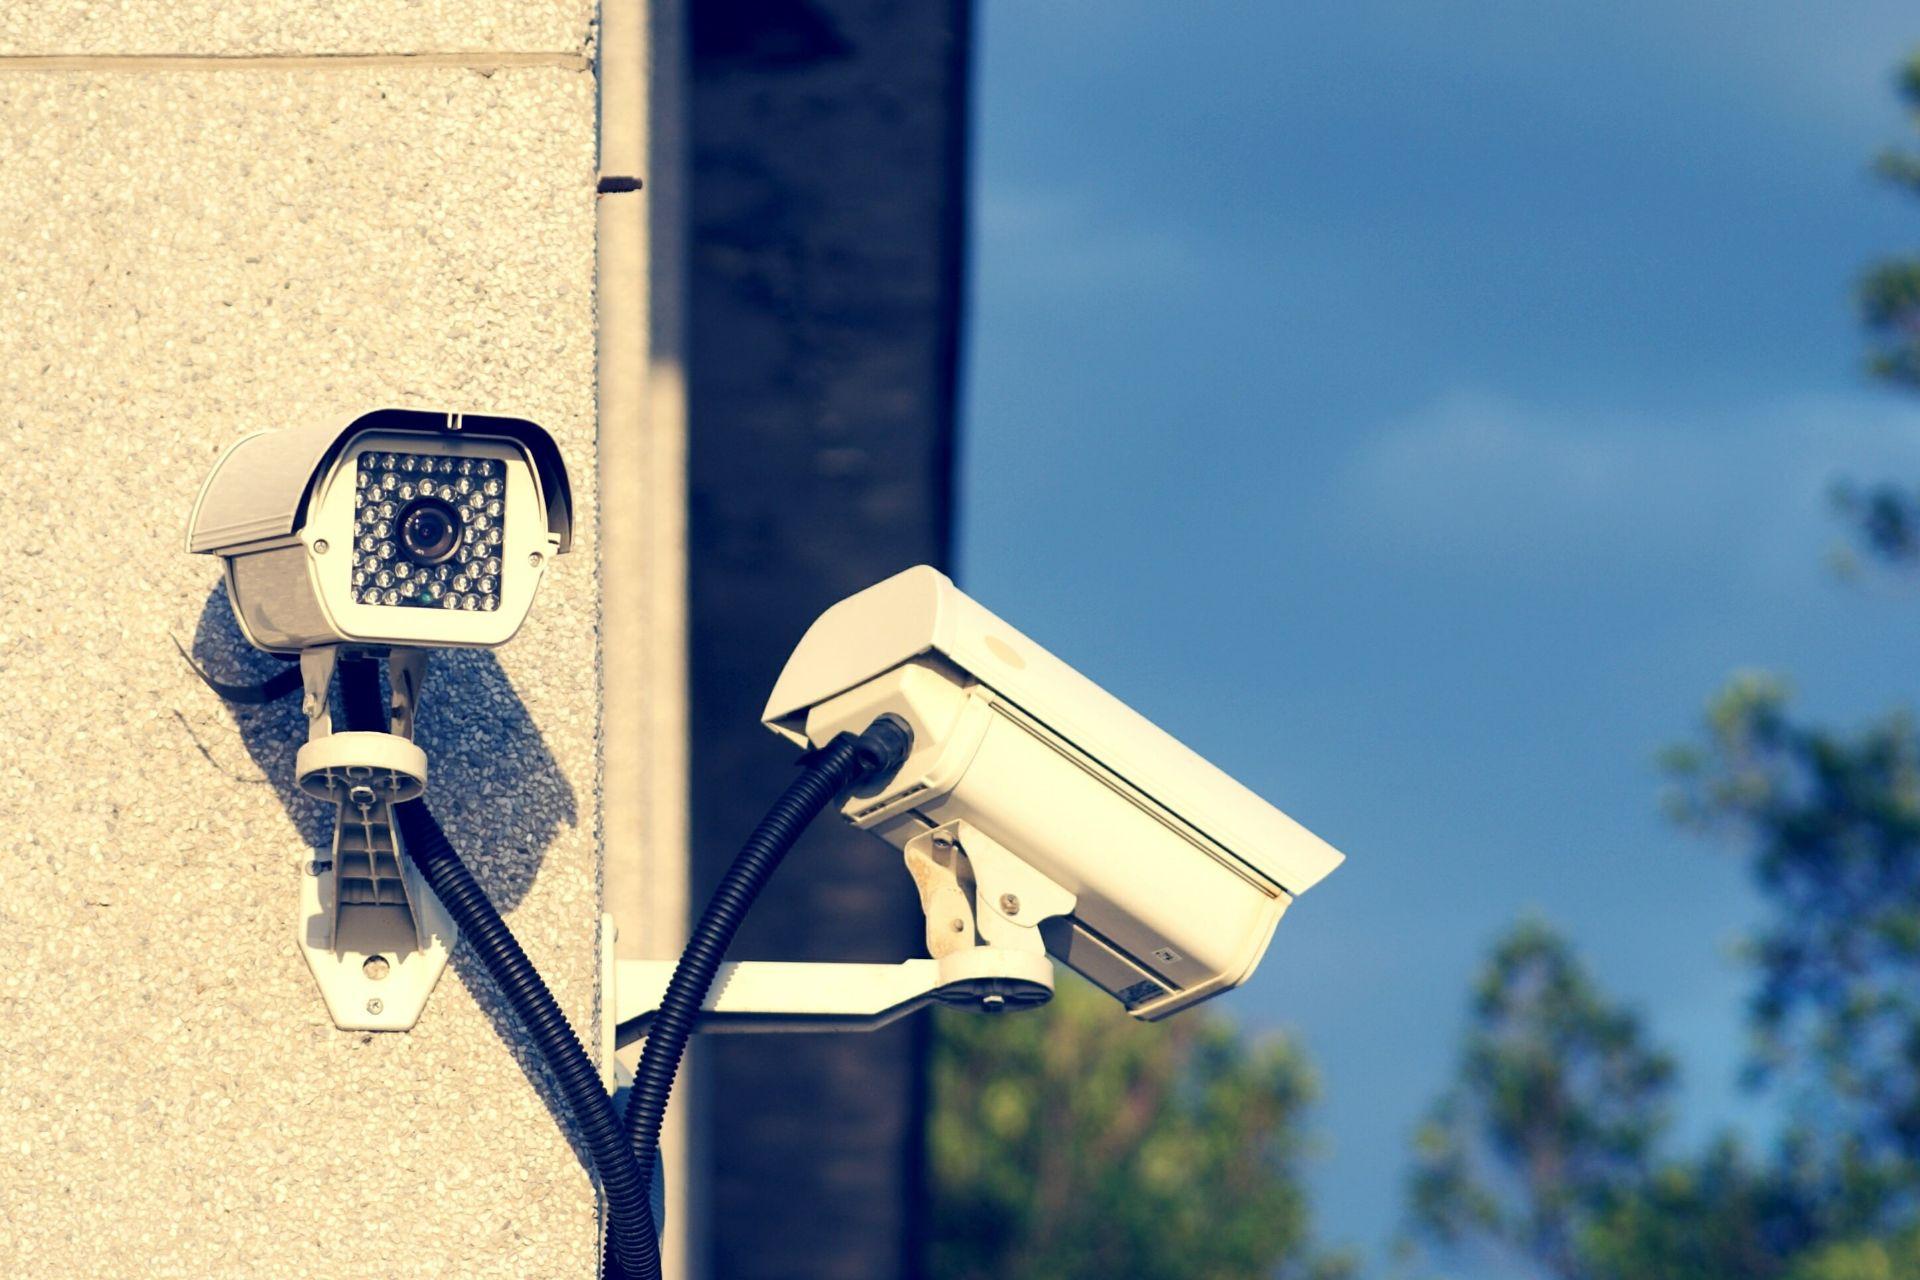 cctv surveillance cameras installed on a business